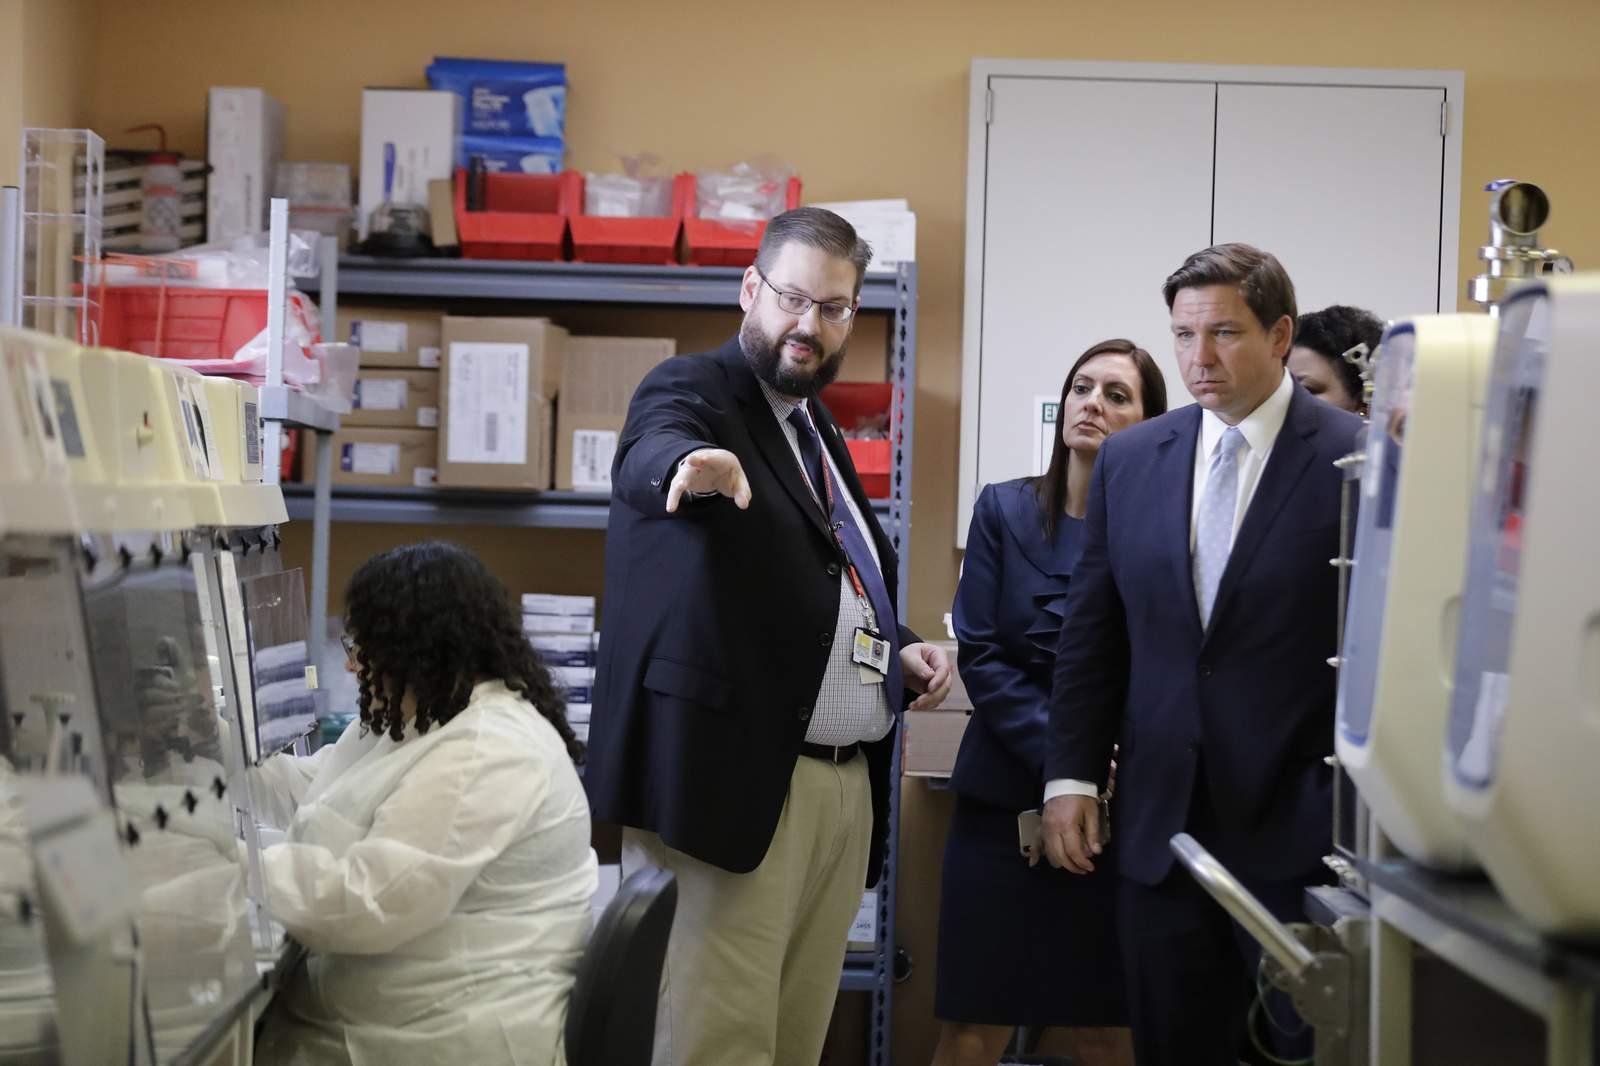 Third Florida coronavirus case reported